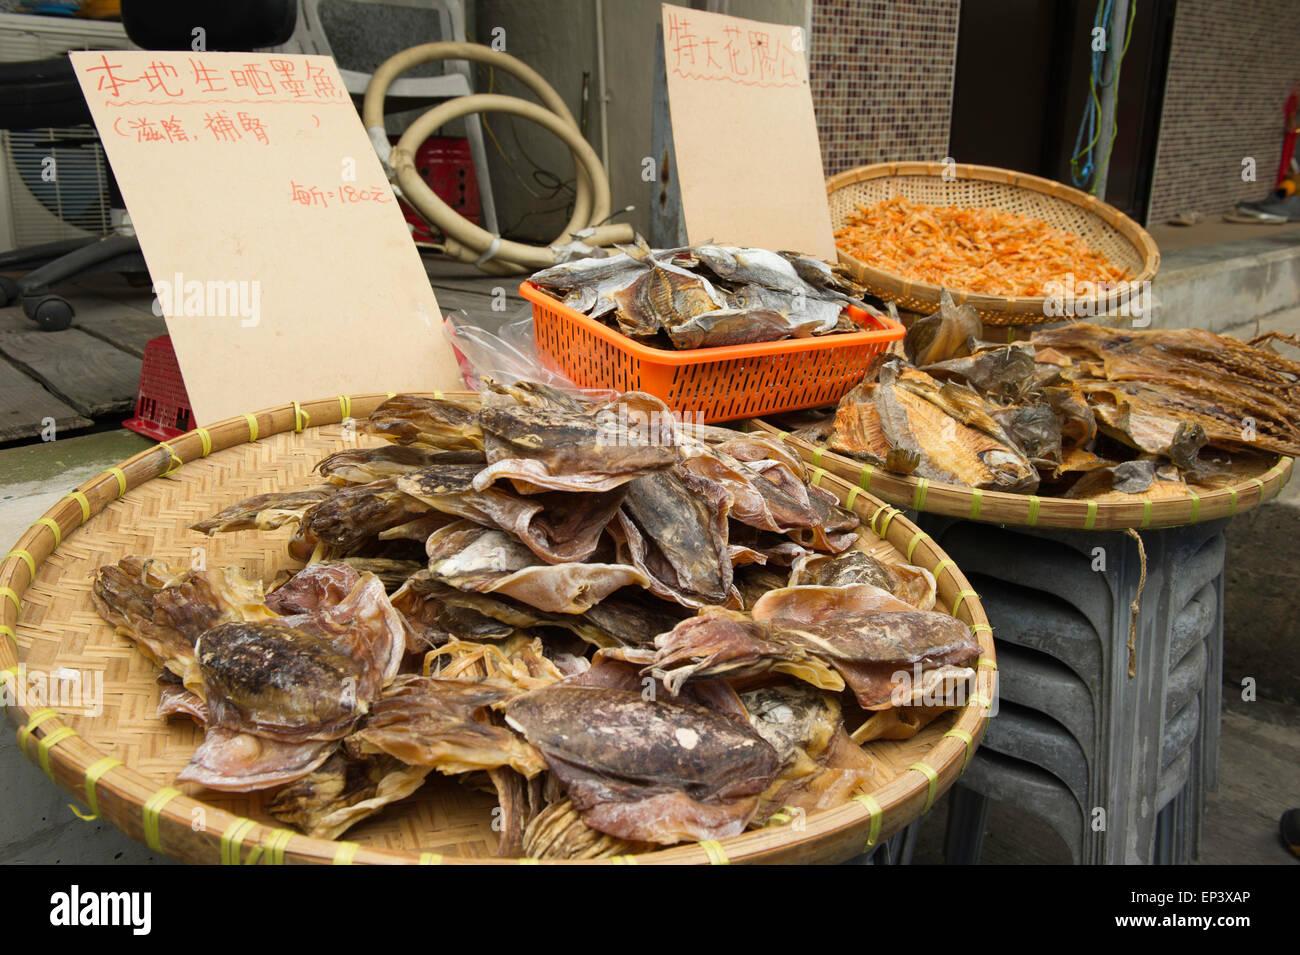 Dried fish at an outdoor street market, Tai O fishing village located on Lantau Island, Hong Kong - Stock Image